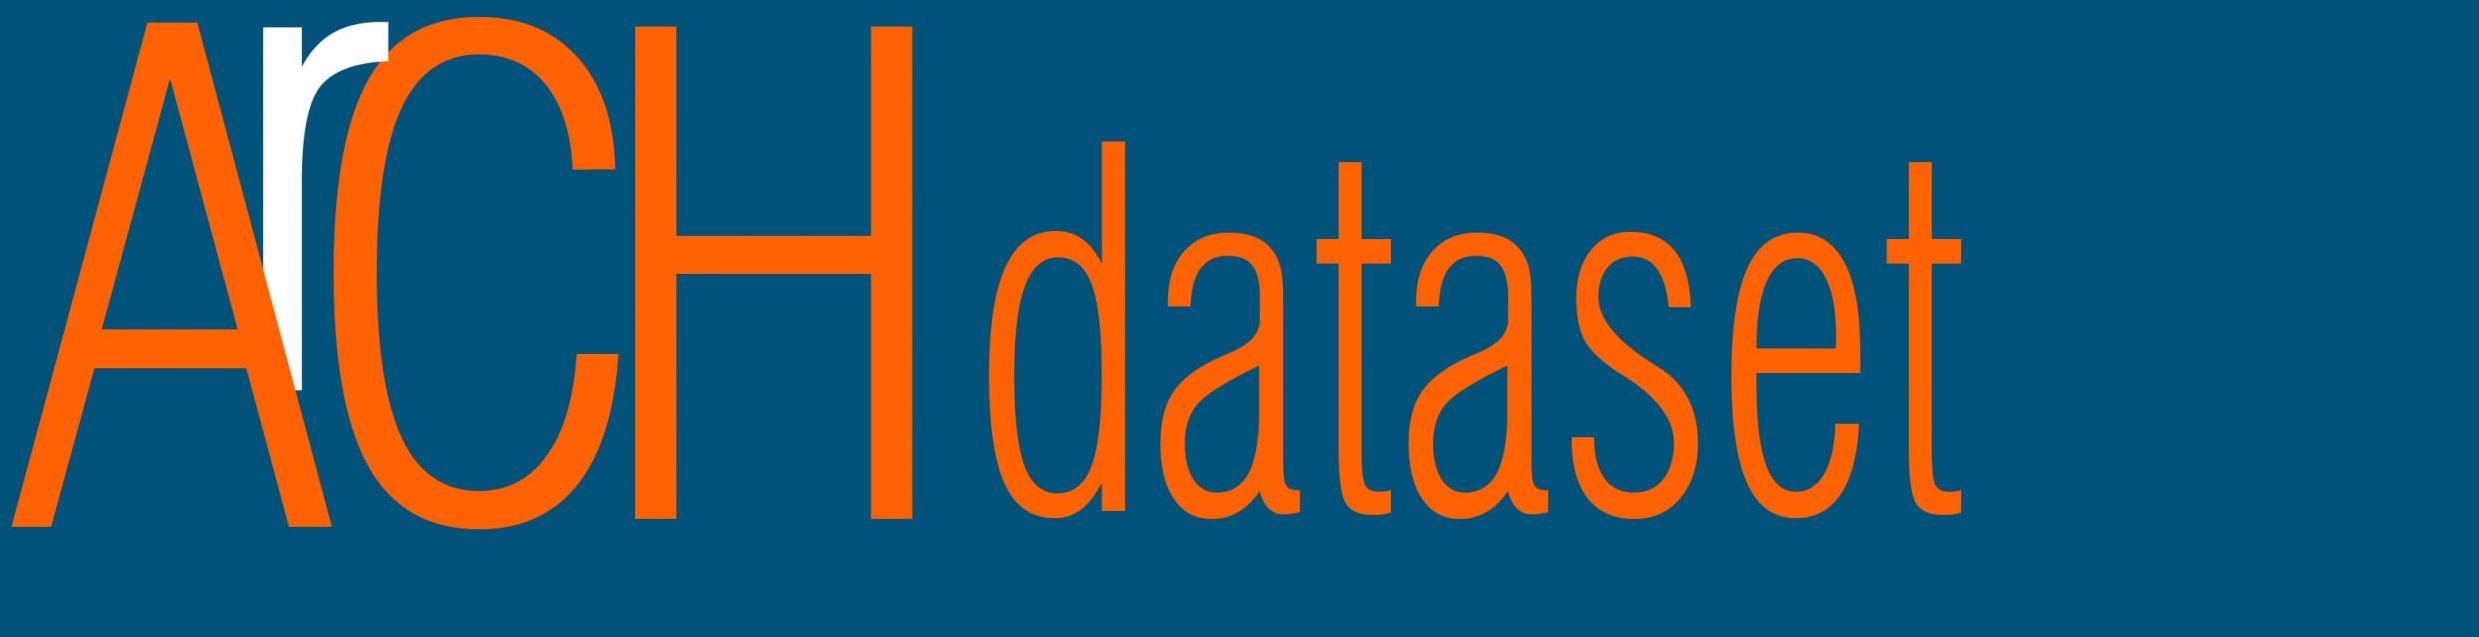 ArCH dataset